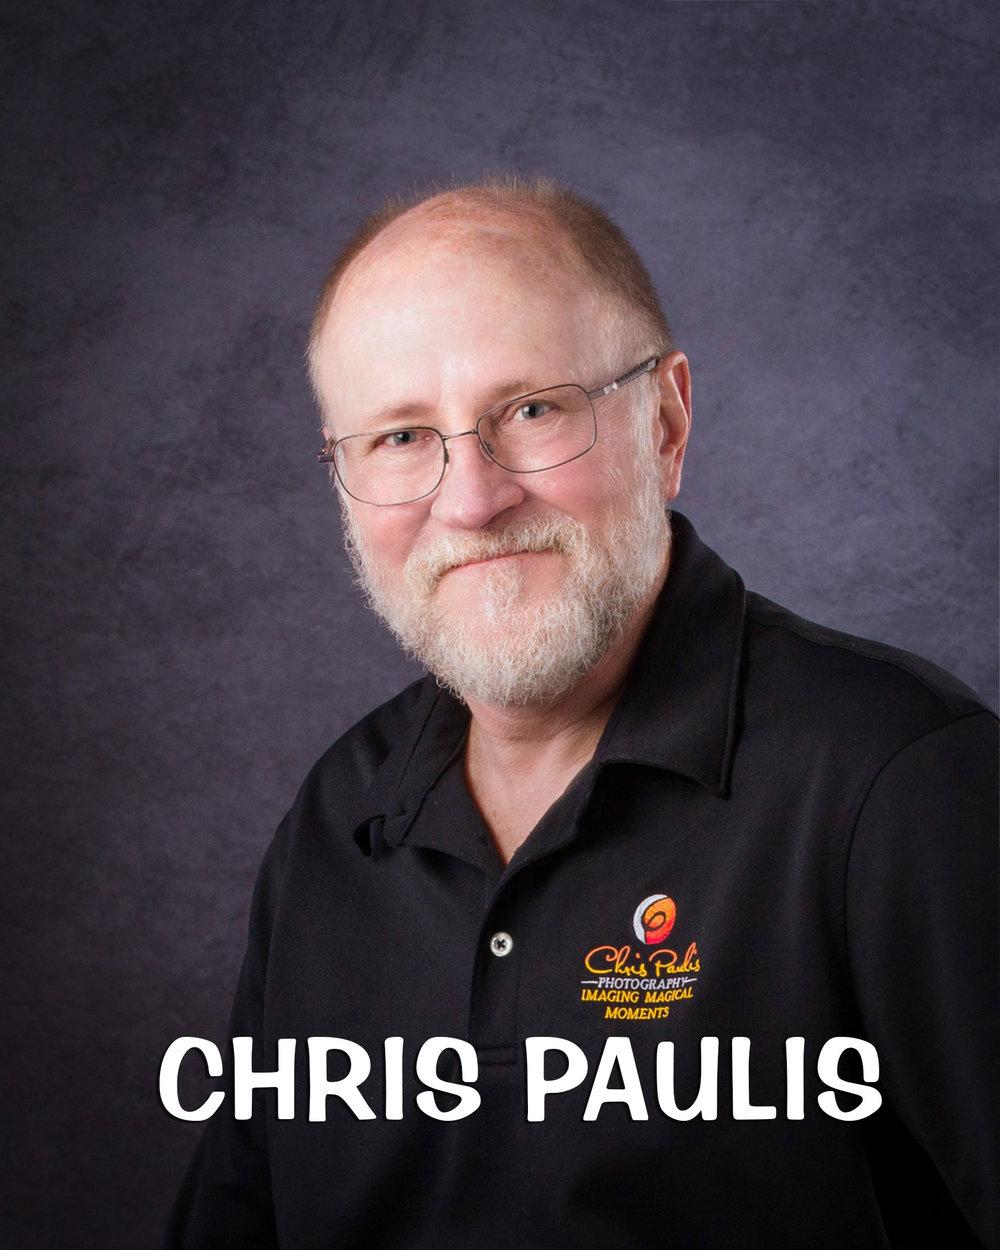 Chris Paulis - Chris_Paulis_3x4-2100pxWORDS.jpg